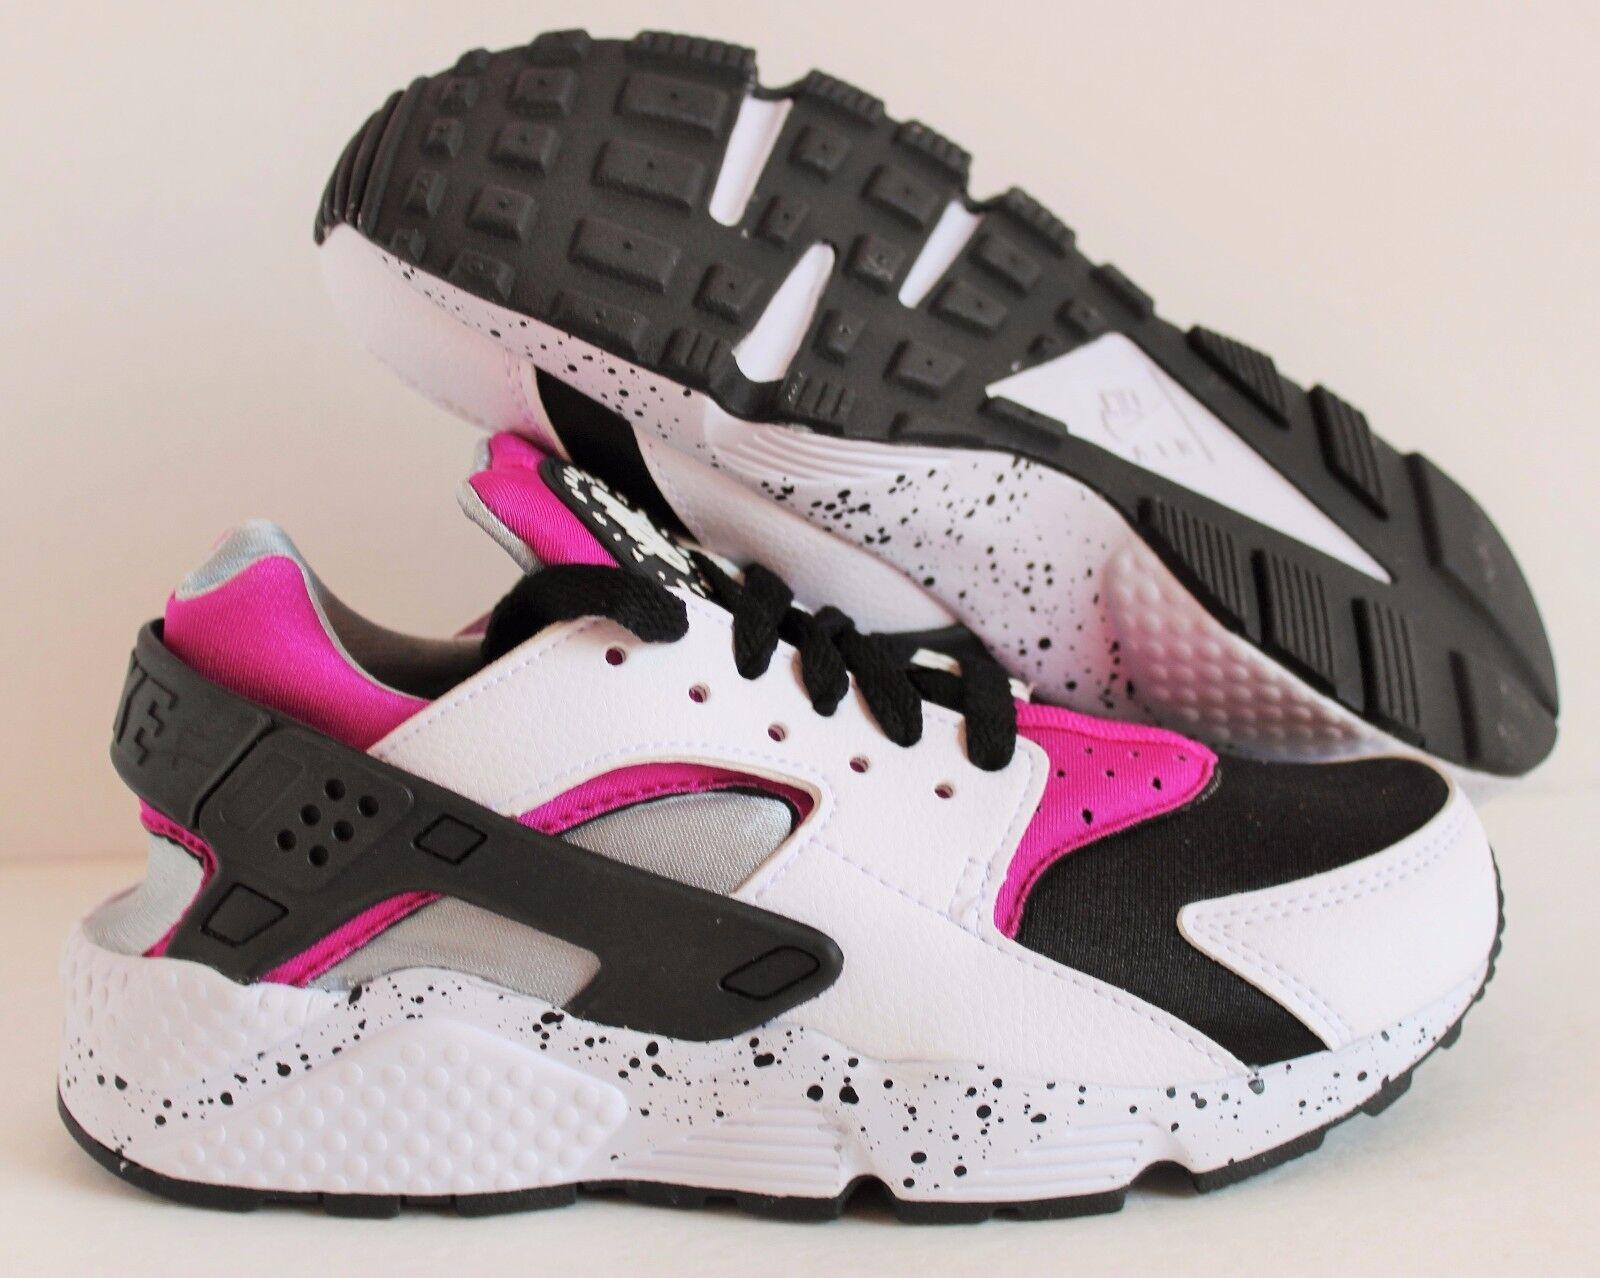 Nike Women's Hurrache Premium ID White-Mgenta-Black SZ 6  [777331-991]